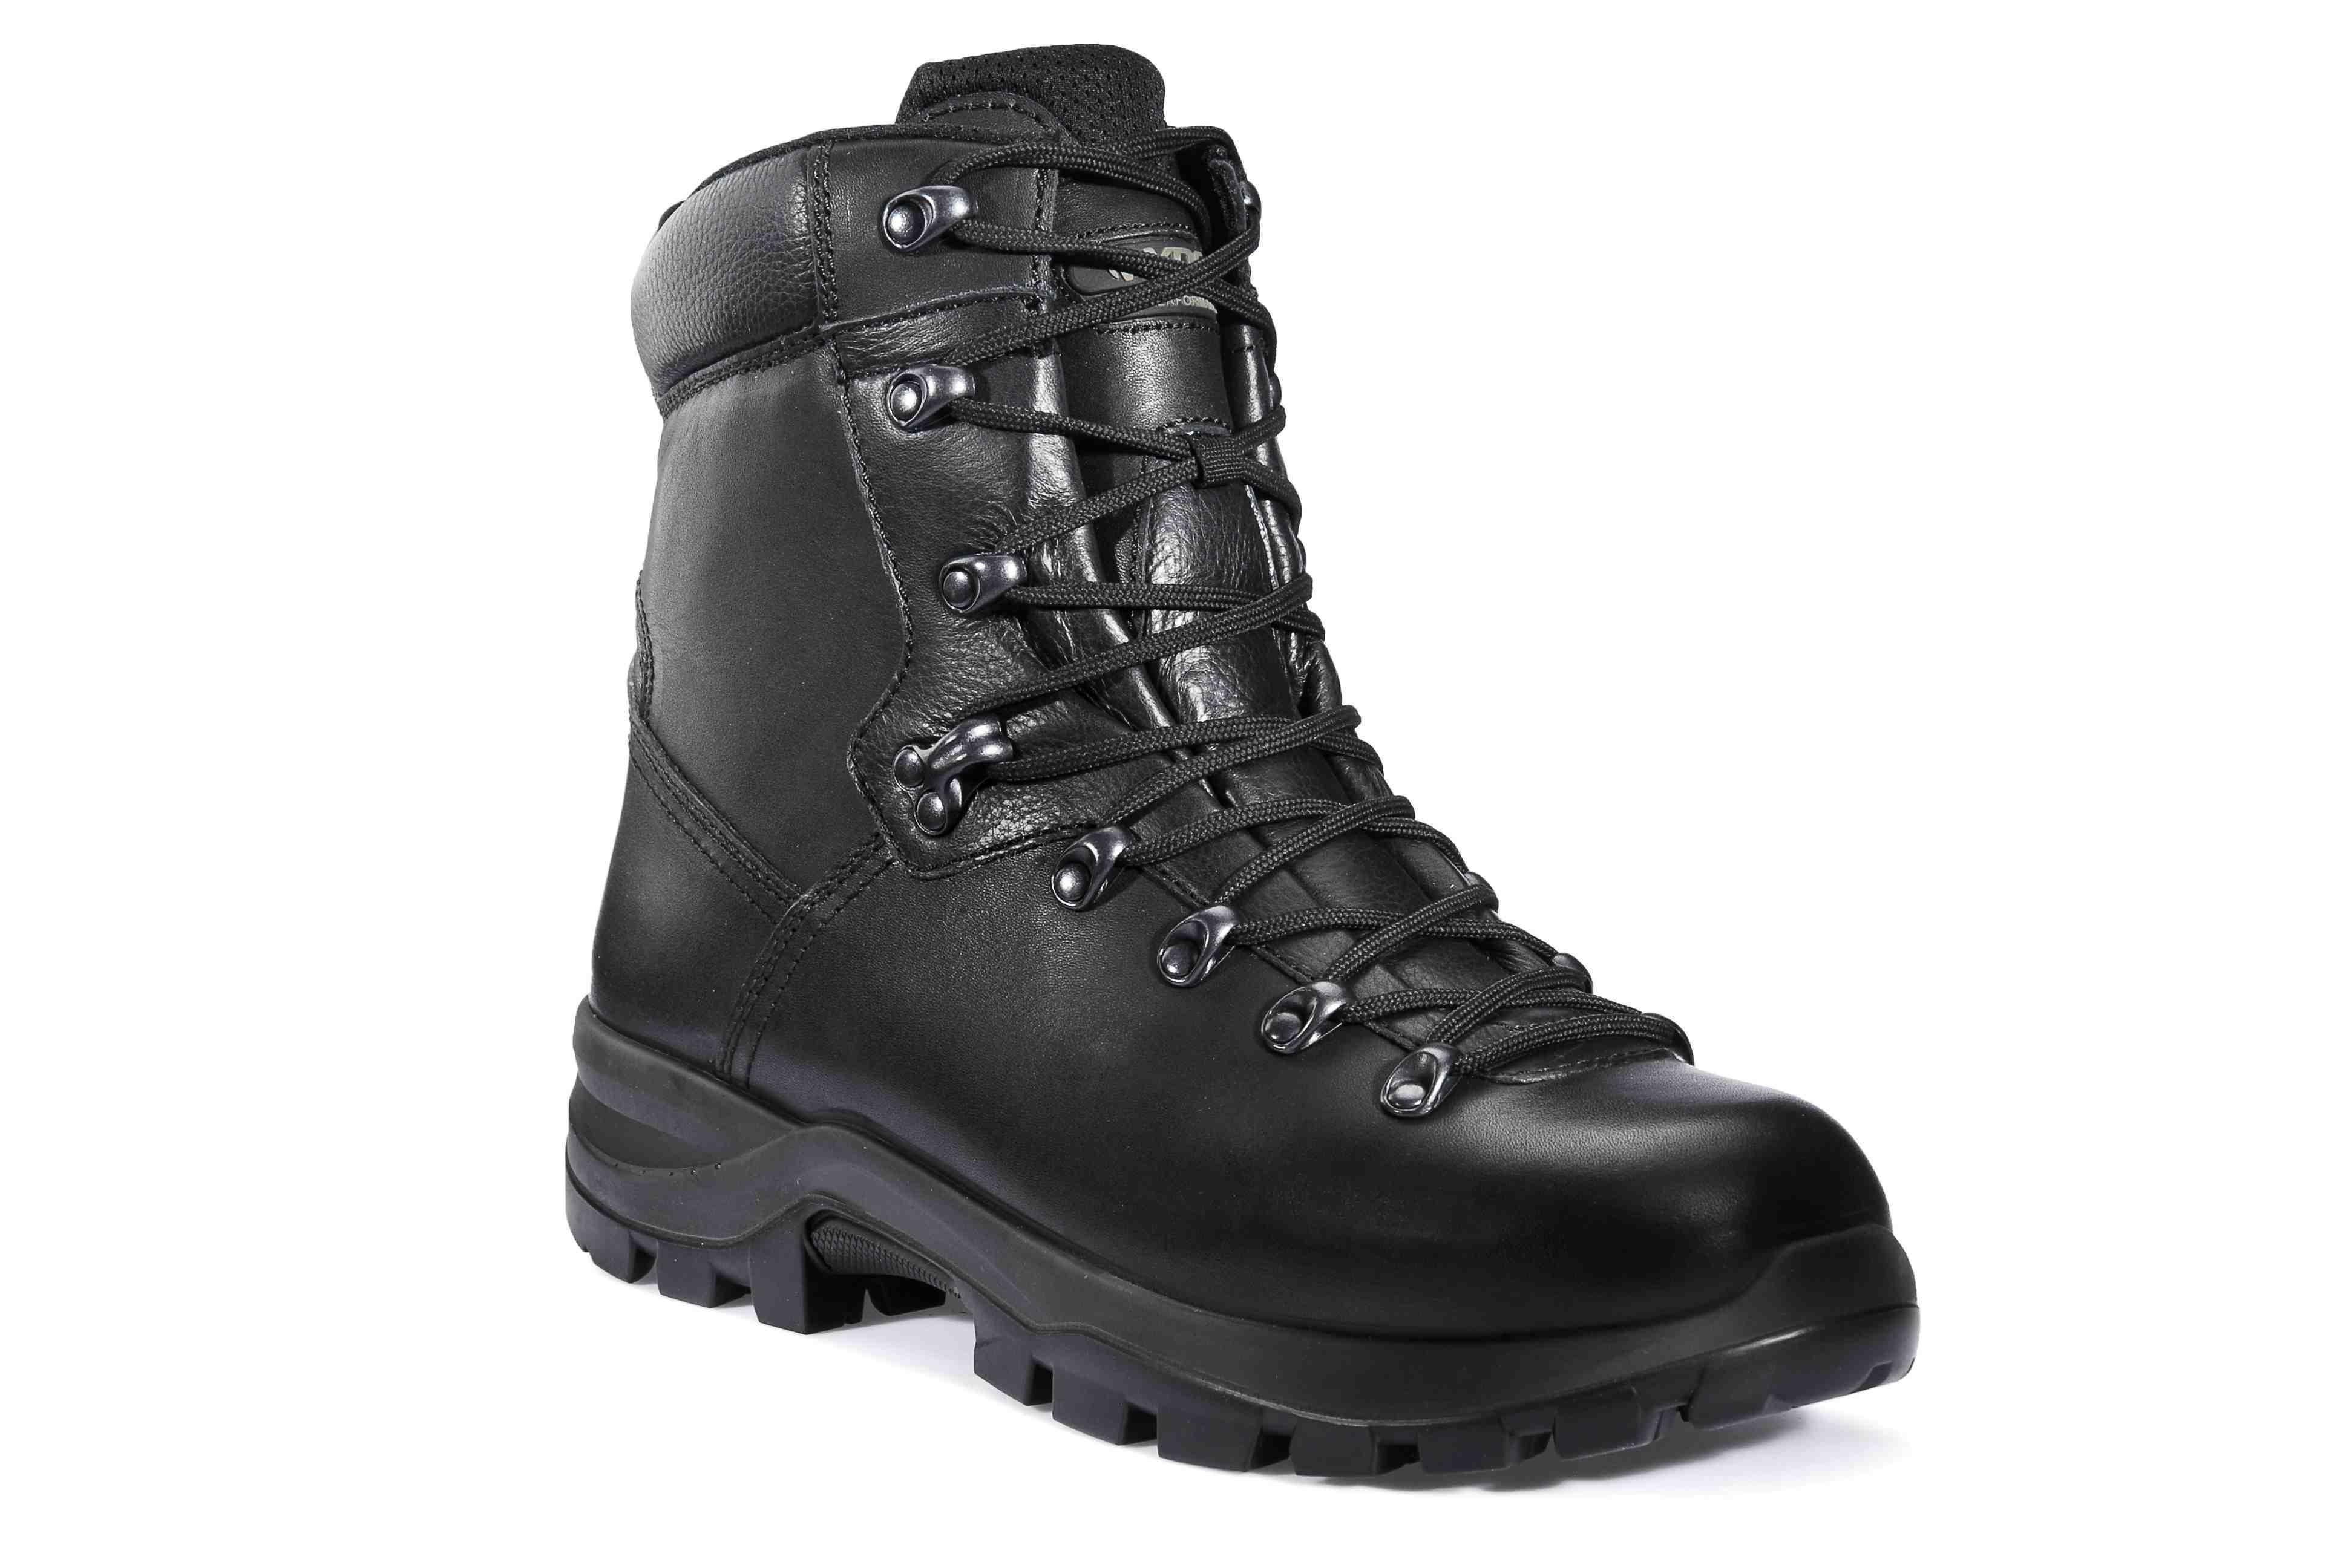 LeBOCK YDS Moraine GTX Combat Boot 02 HRO WR FO